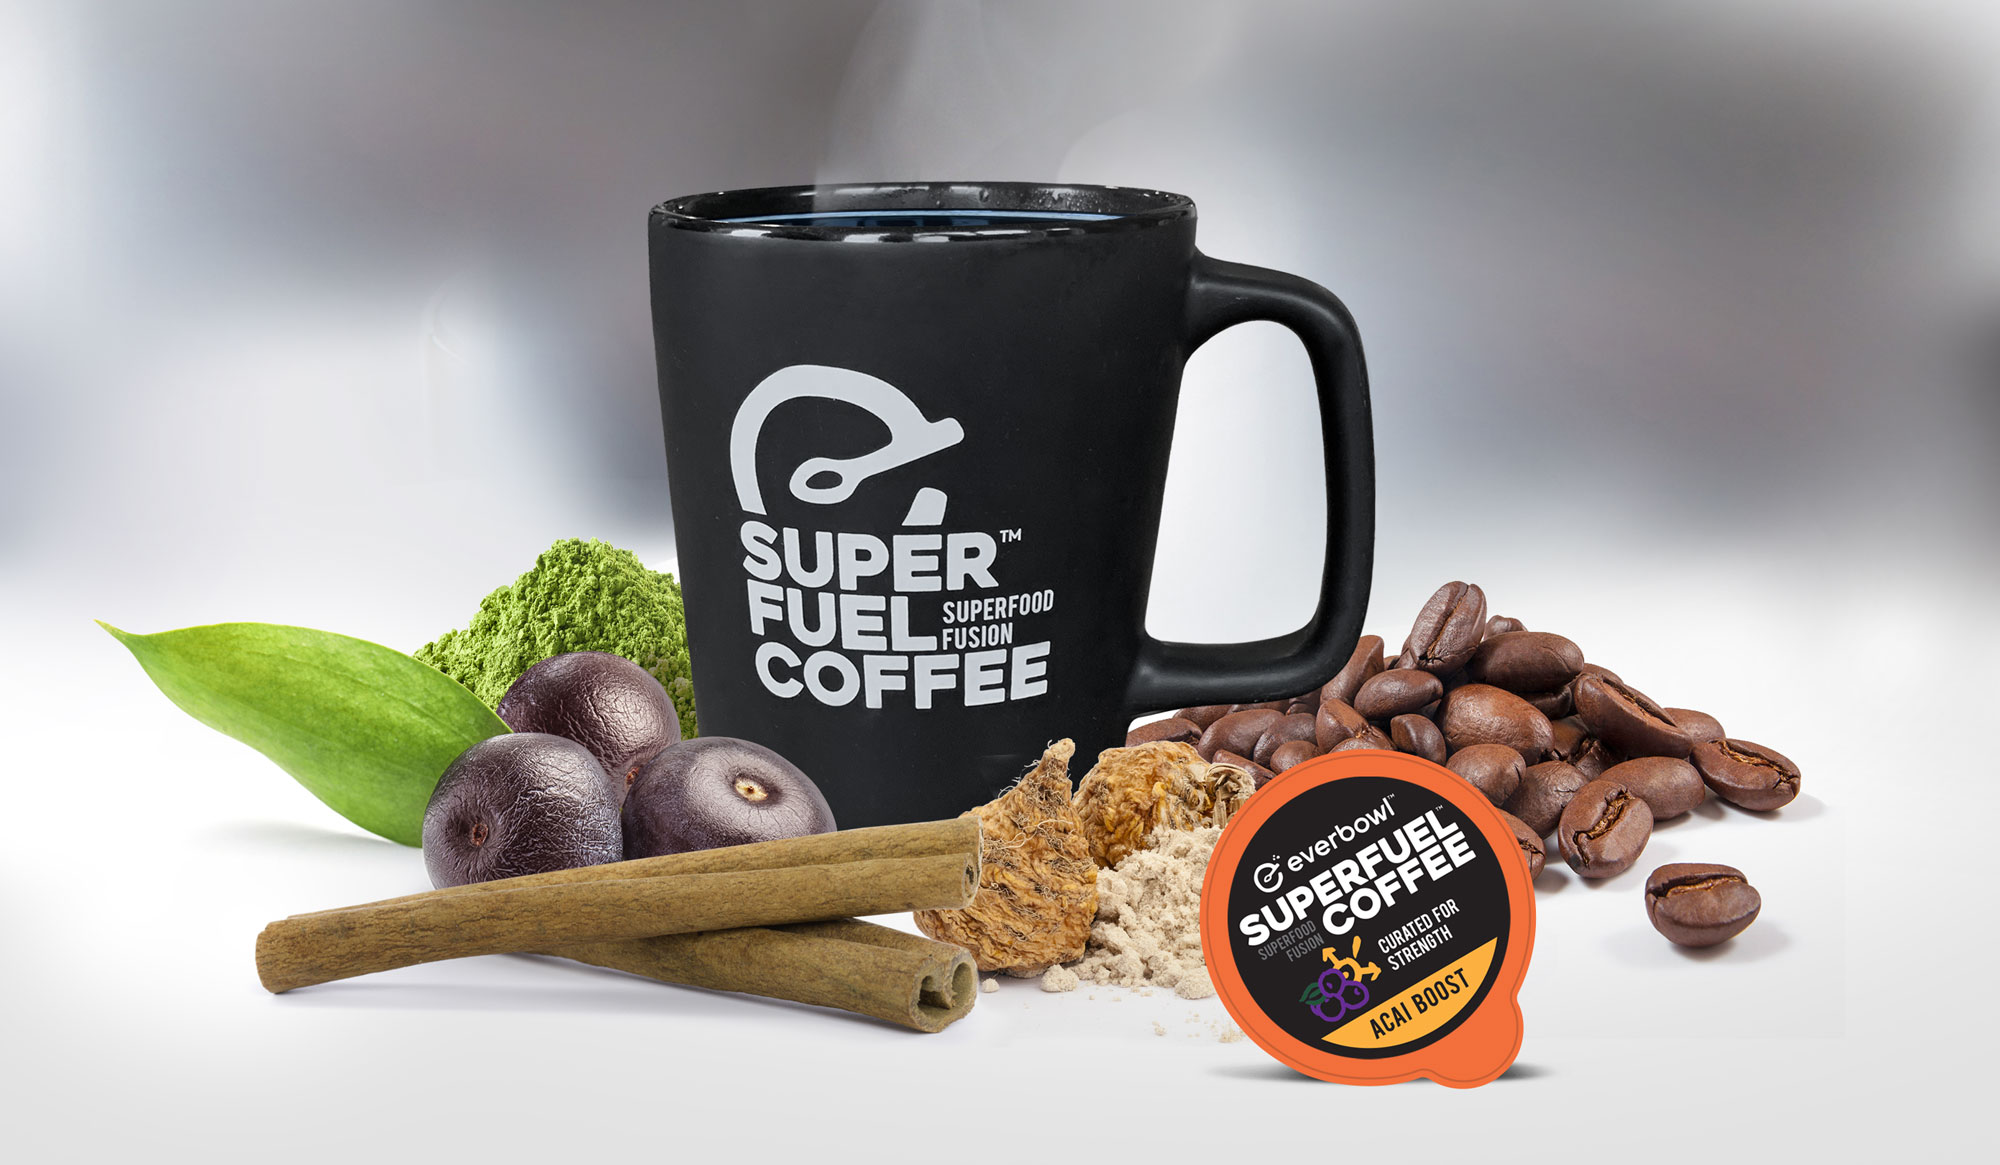 2019-06-10_Coffee_Mock_Boost-CUP-WEB-IMAGE.jpg